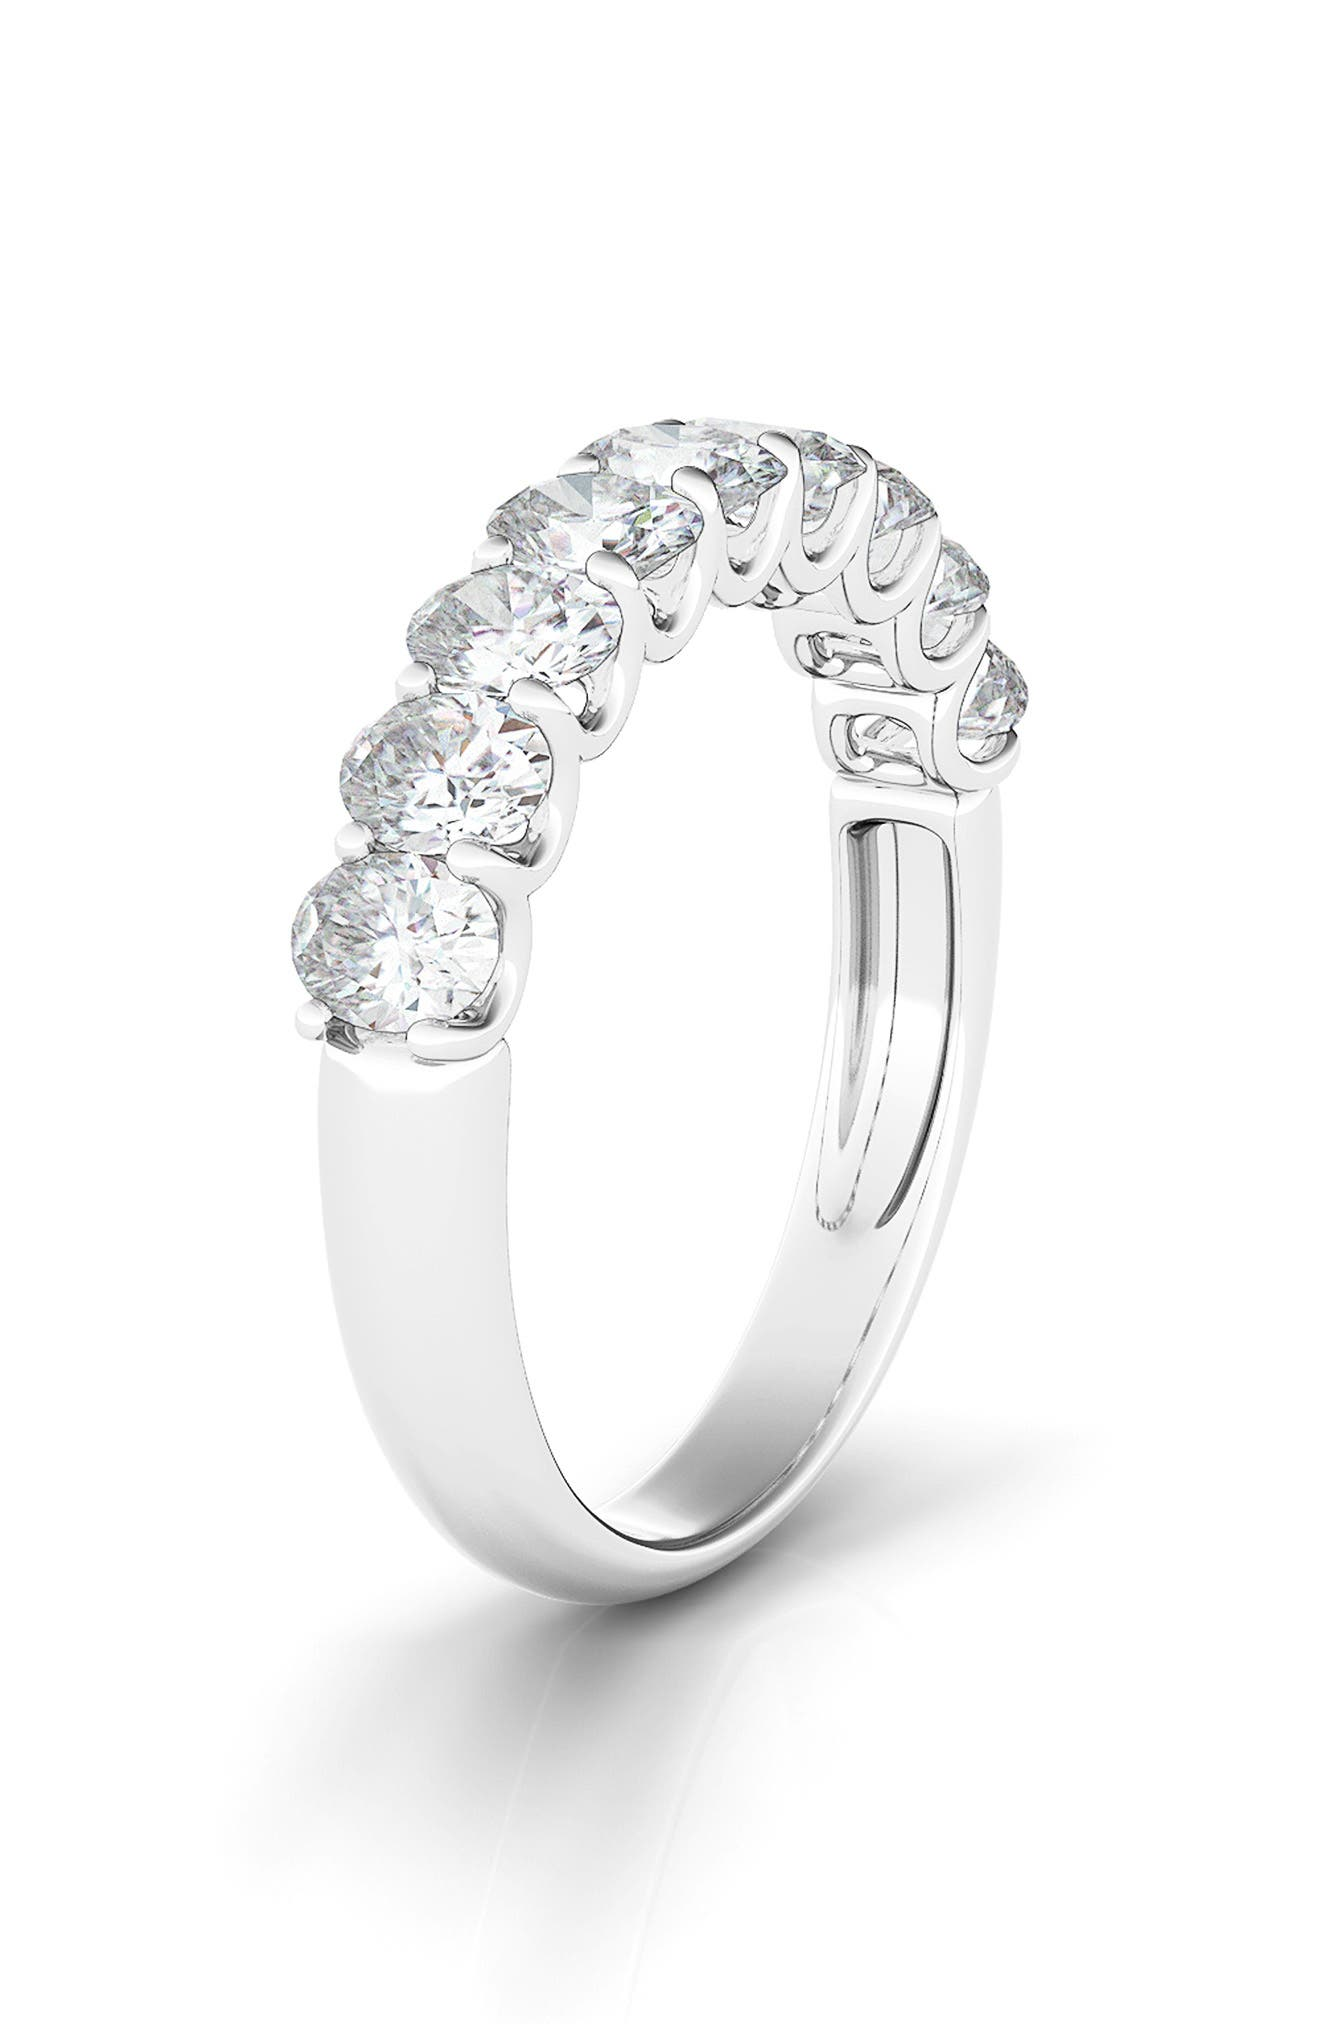 Half Oval Cut Lab Created Diamond 14K Gold Eternity Ring